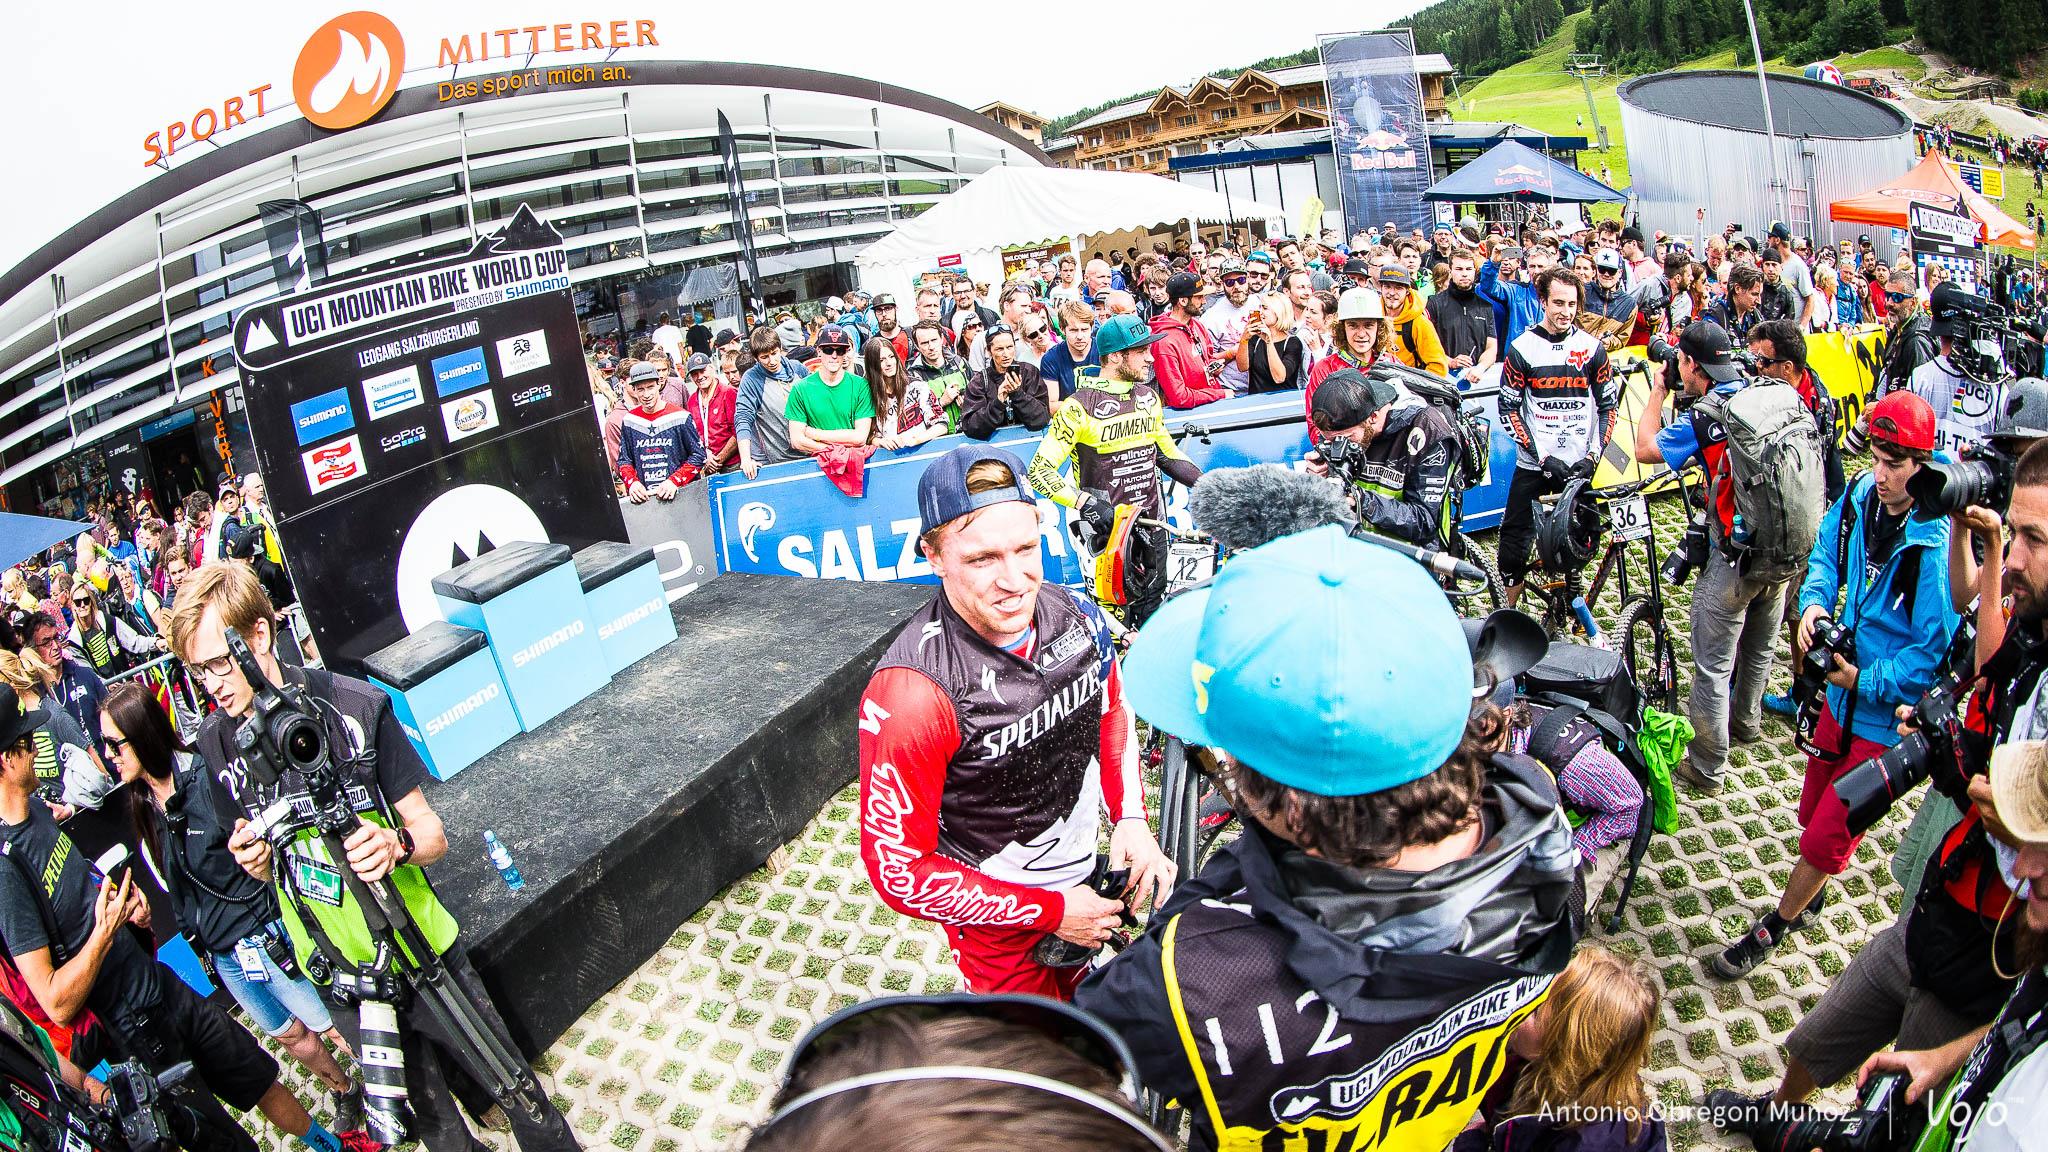 Leogang_UCI_World_Cup_DH_2015_(Porfolio)_(Gwin)_(Copyright_Antonio_Obregon_VojoMag-92